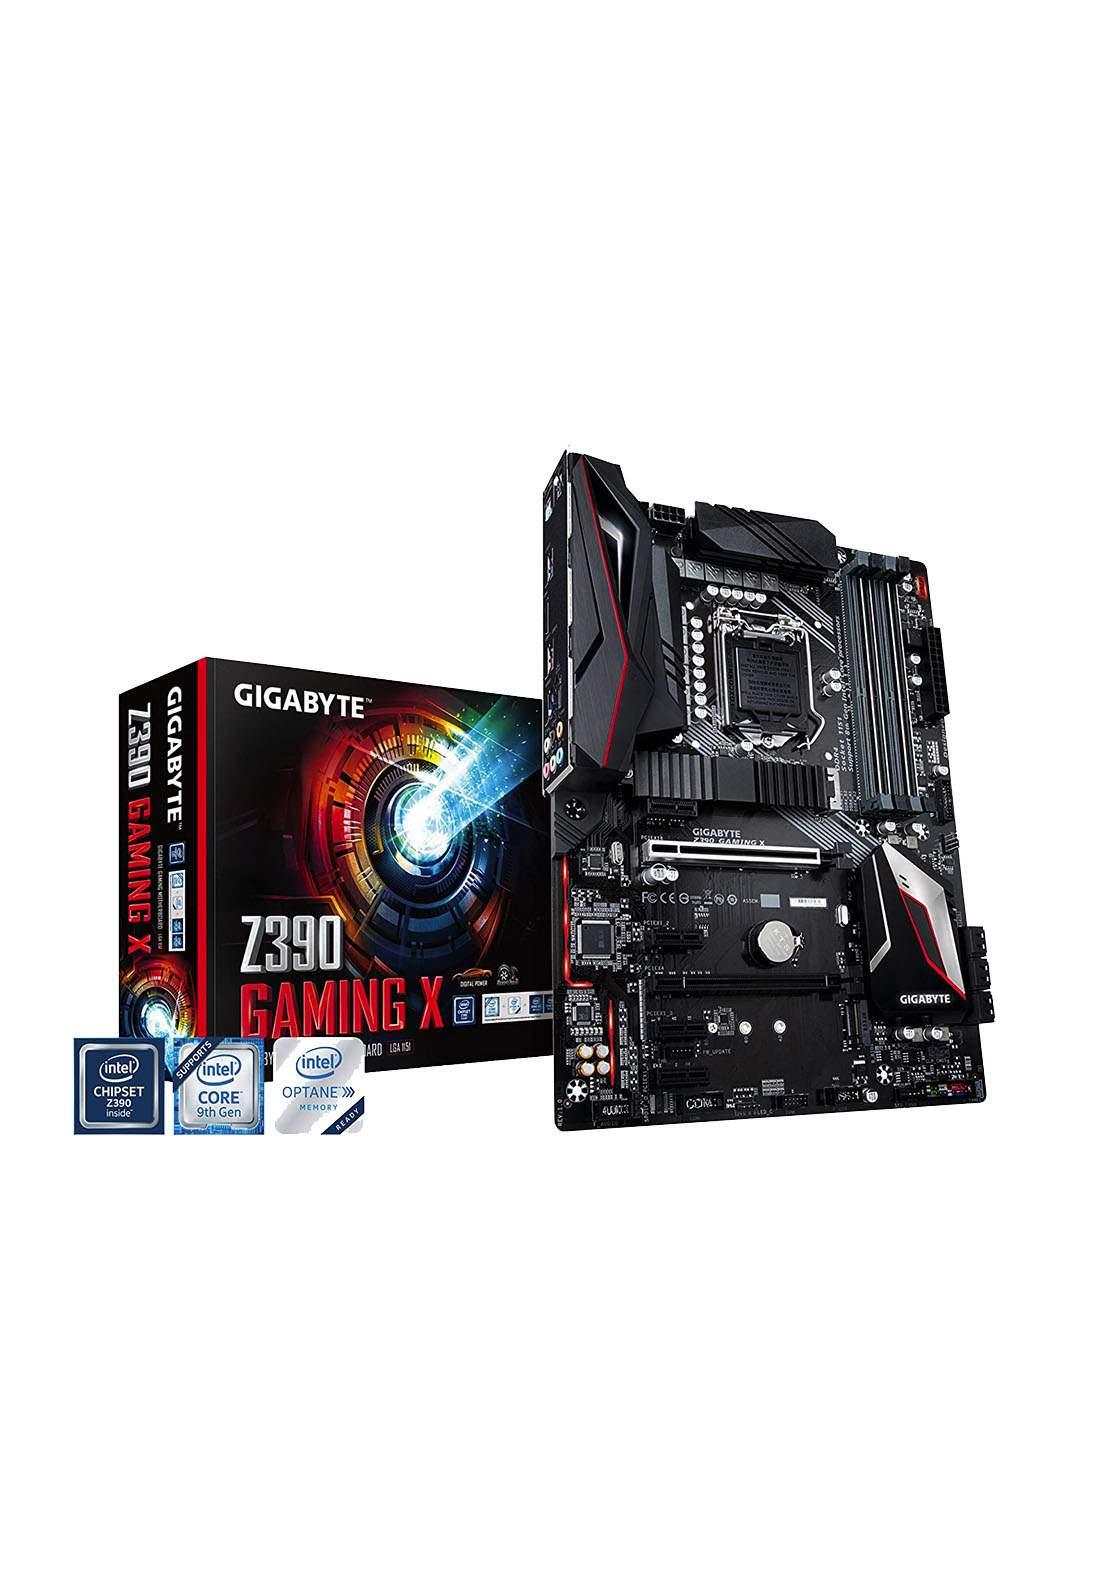 Gigabyte Z390 Gaming X Socket Lga 1151 Motherboard لوحة الام